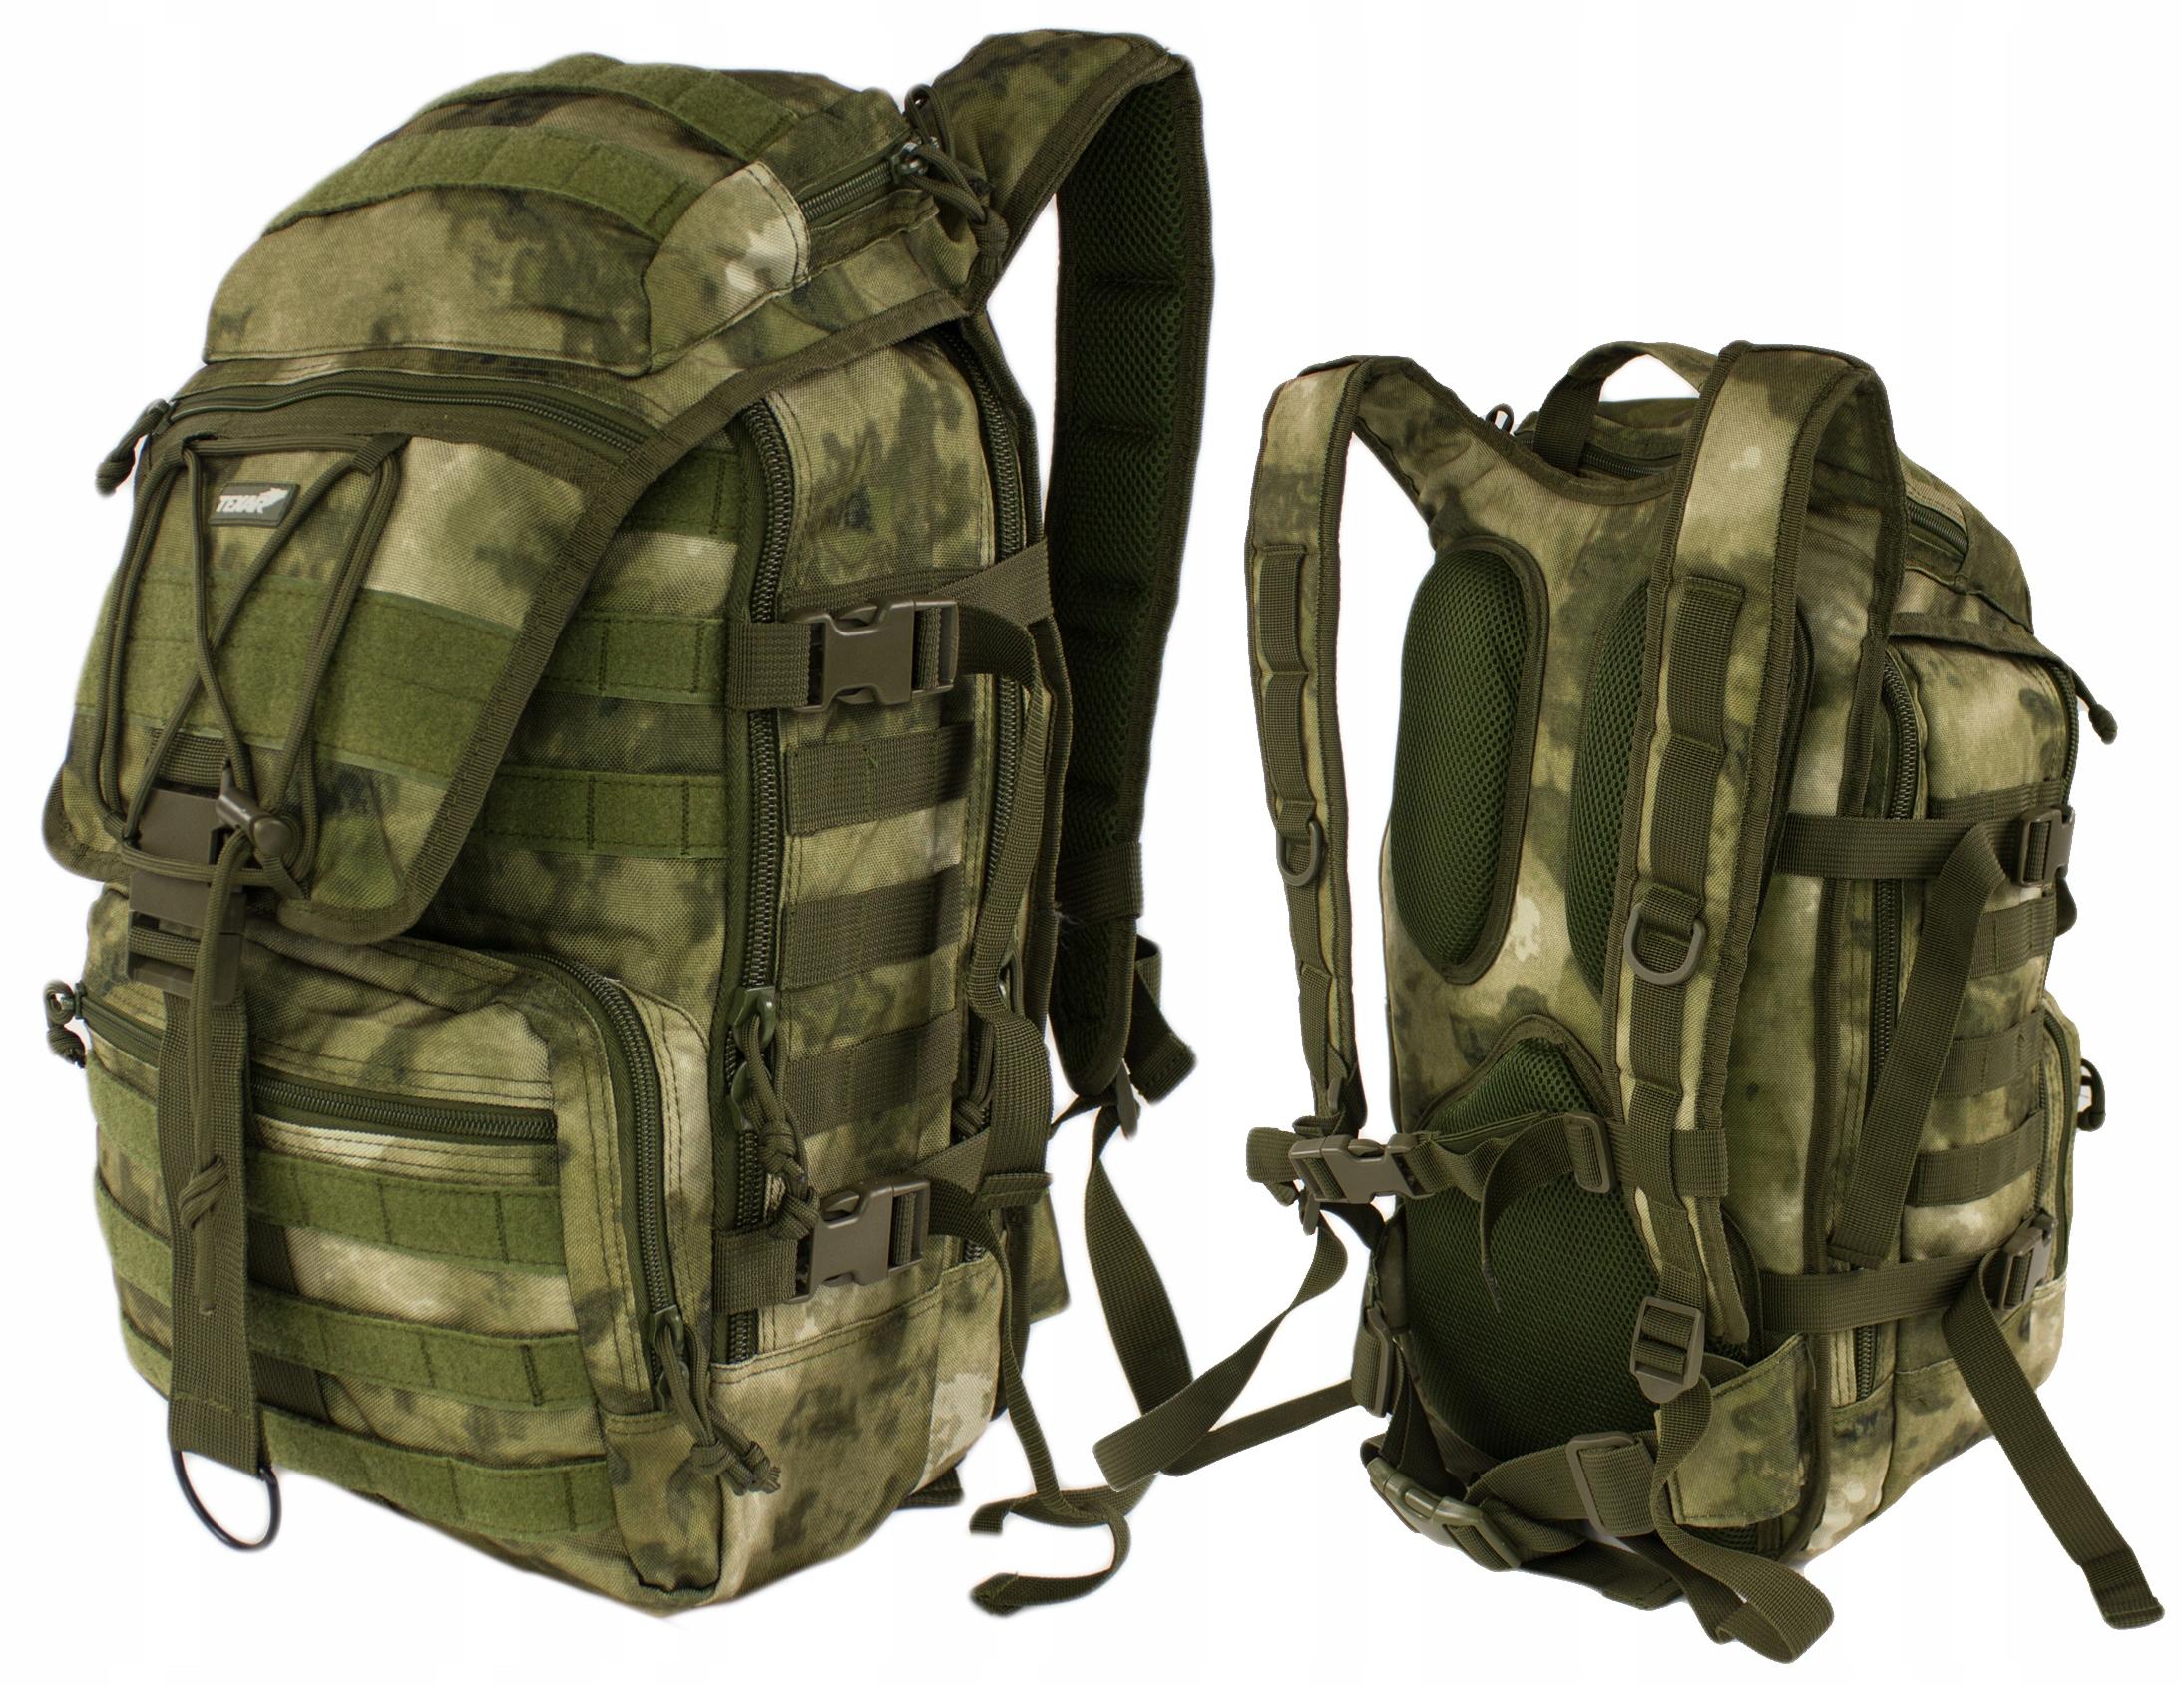 Survivalowy Plecak Taktyczny Texar Traper FG-Cam